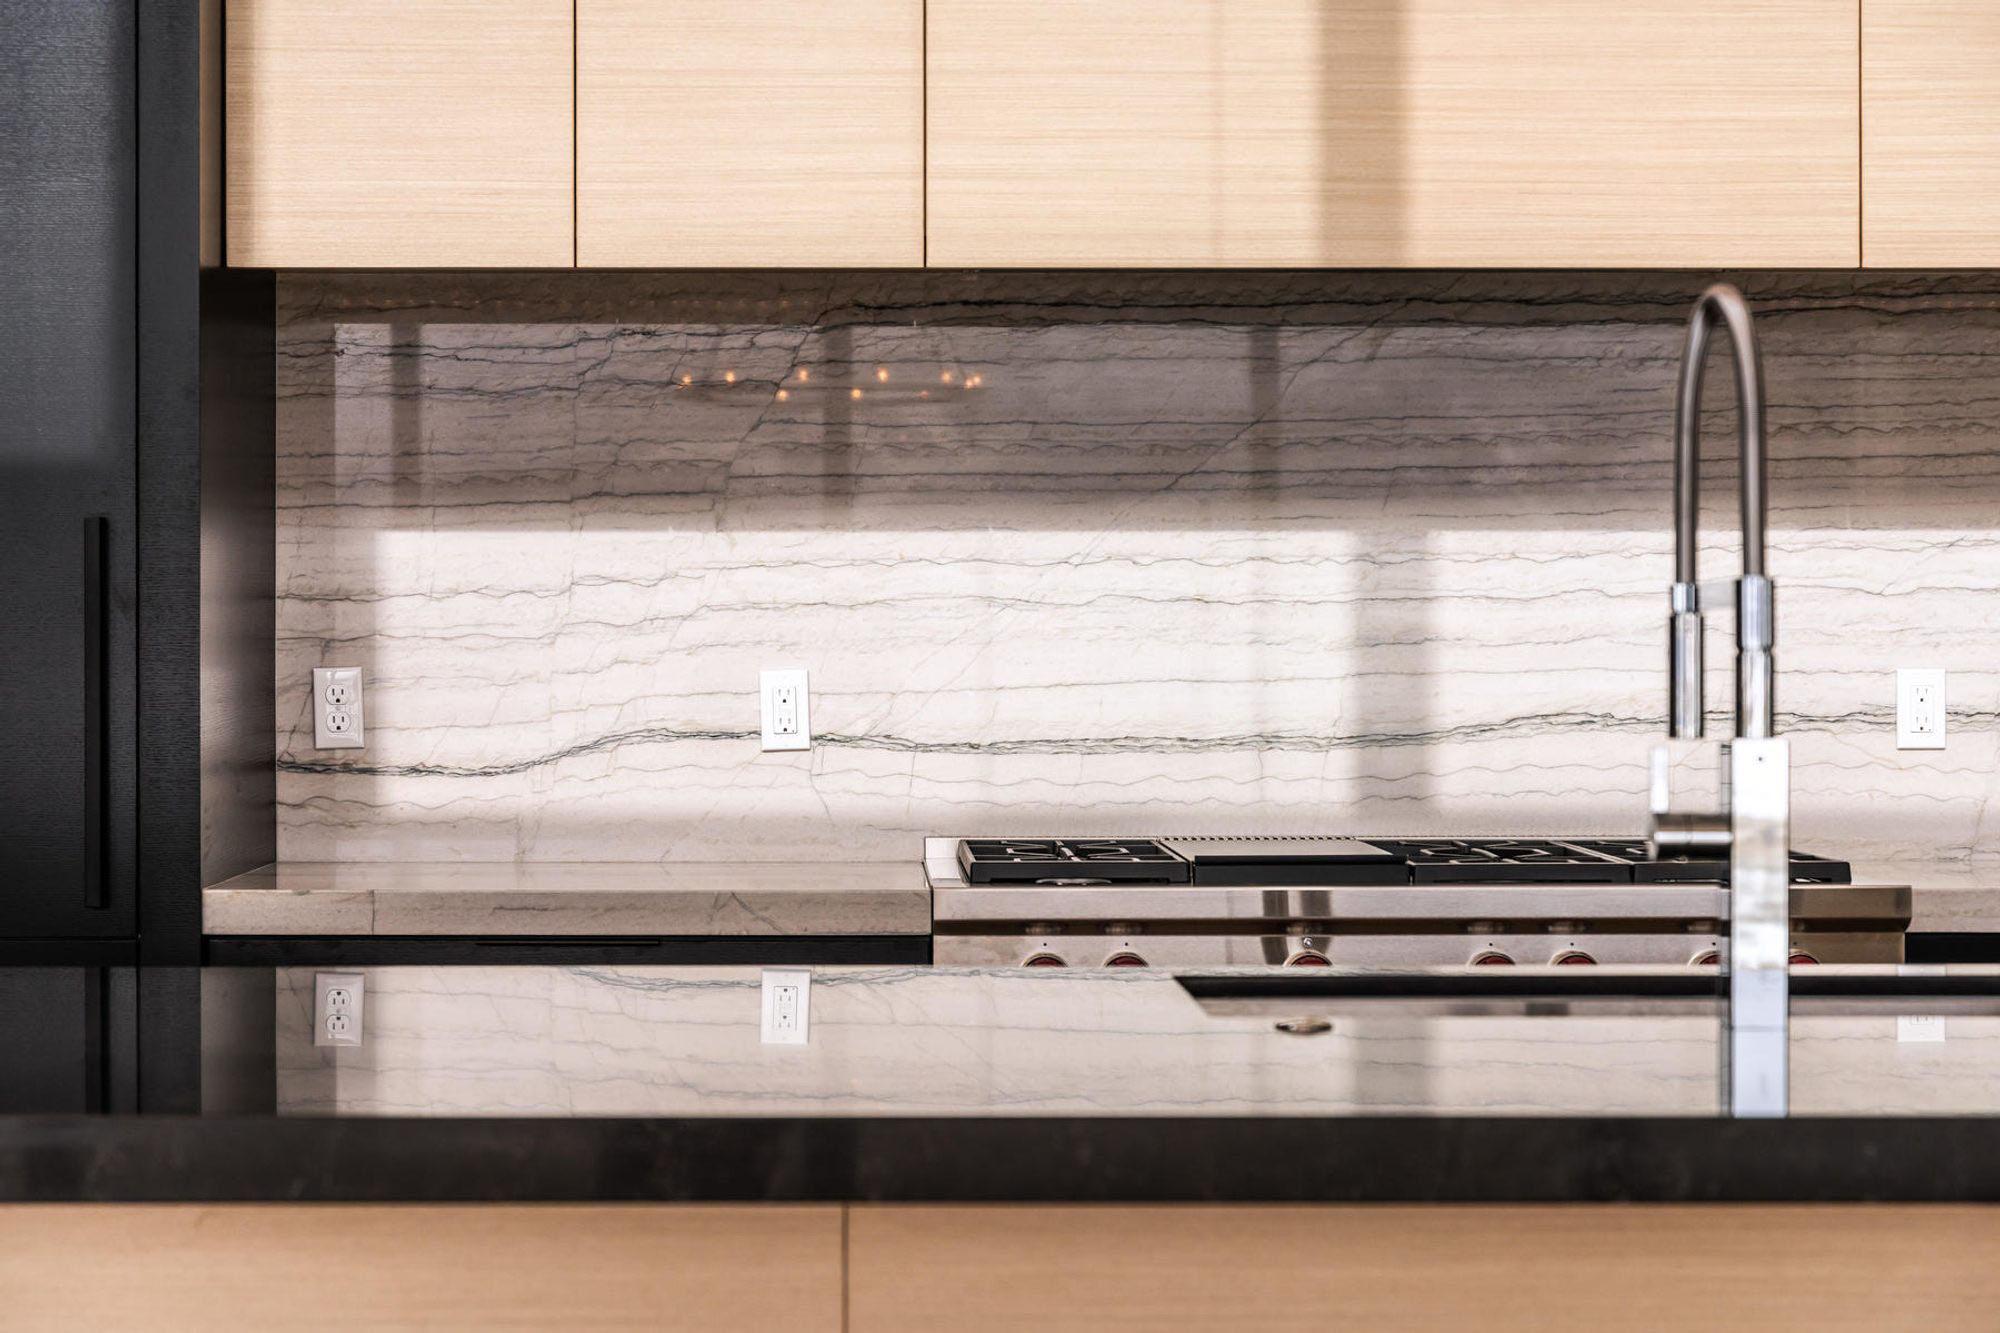 Ultra modern kitchen design with solid slab backsplash and flat faced cabinetry.